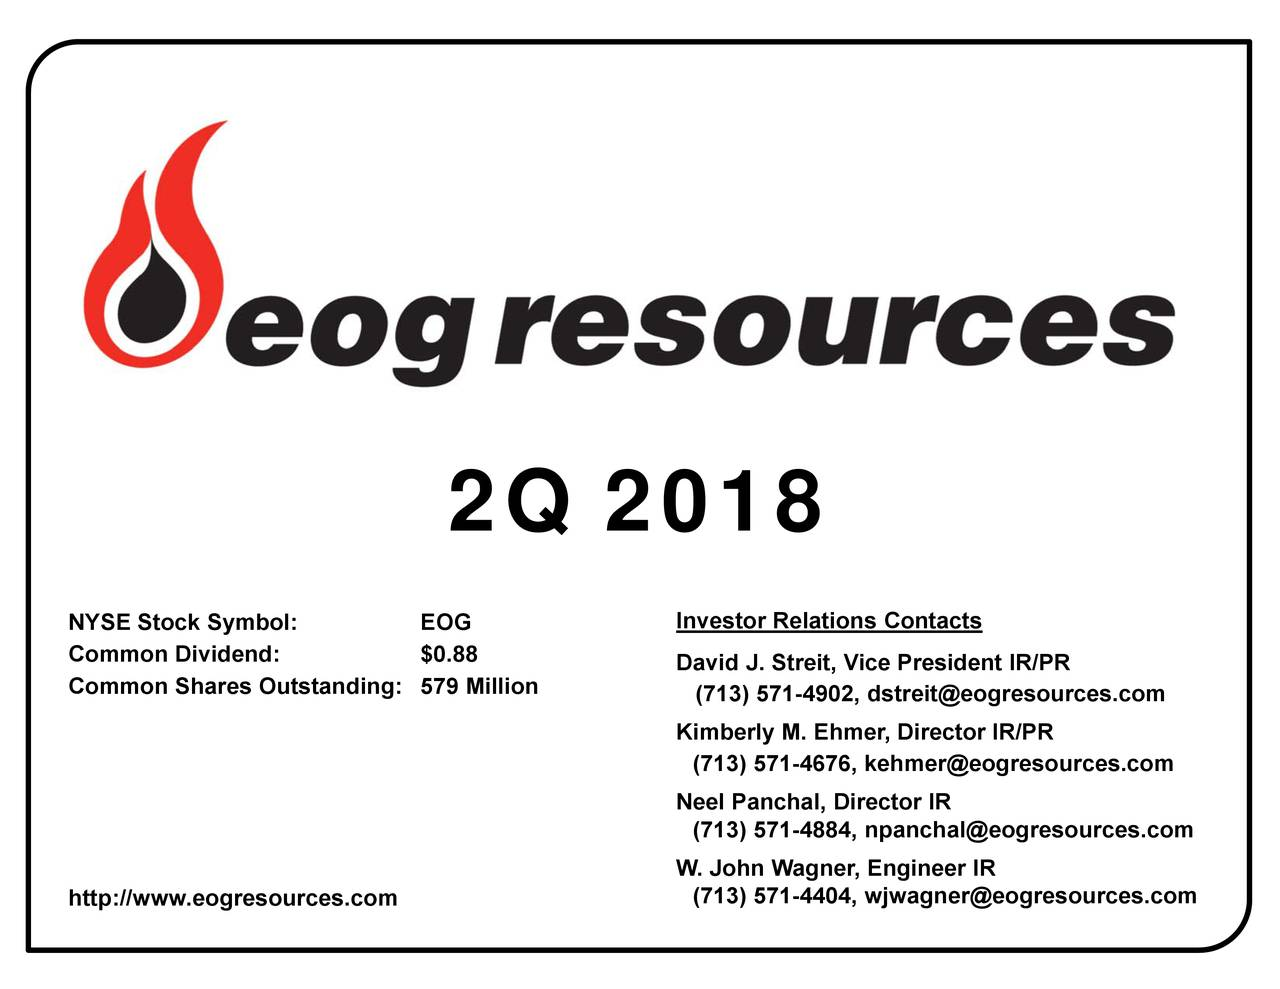 InvestviRe.SirnleMinW. John Wagner, Engineer IR 2Q 2018 NYCSoCStockDymibold: Ohtttn/dngGe.88esoilces.com